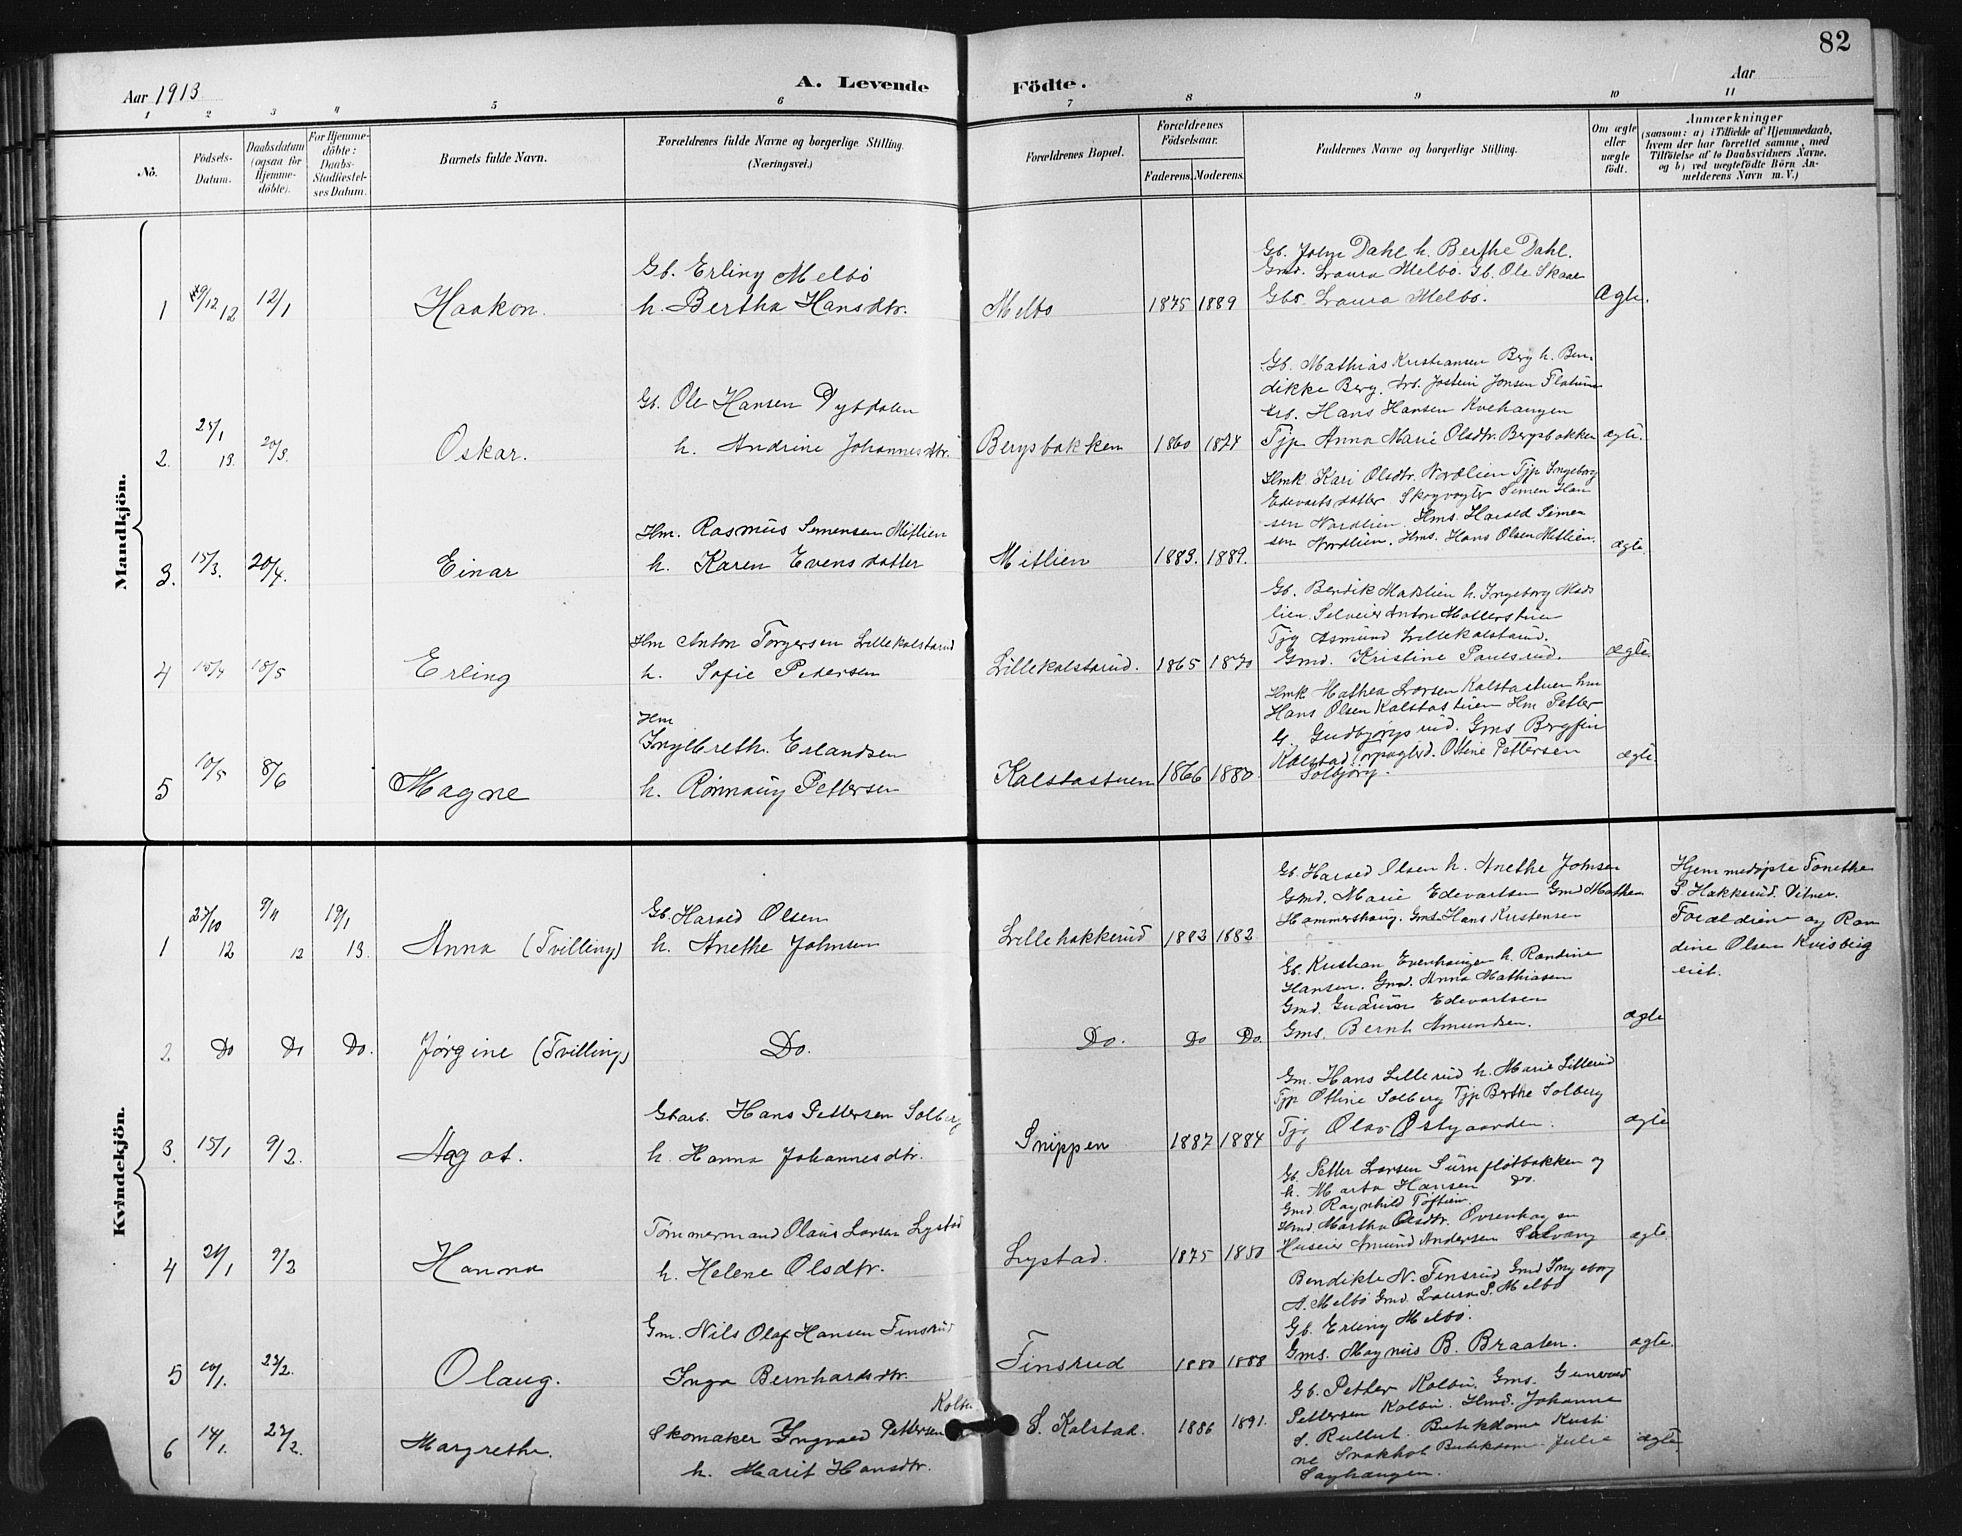 SAH, Vestre Gausdal prestekontor, Klokkerbok nr. 3, 1896-1925, s. 82